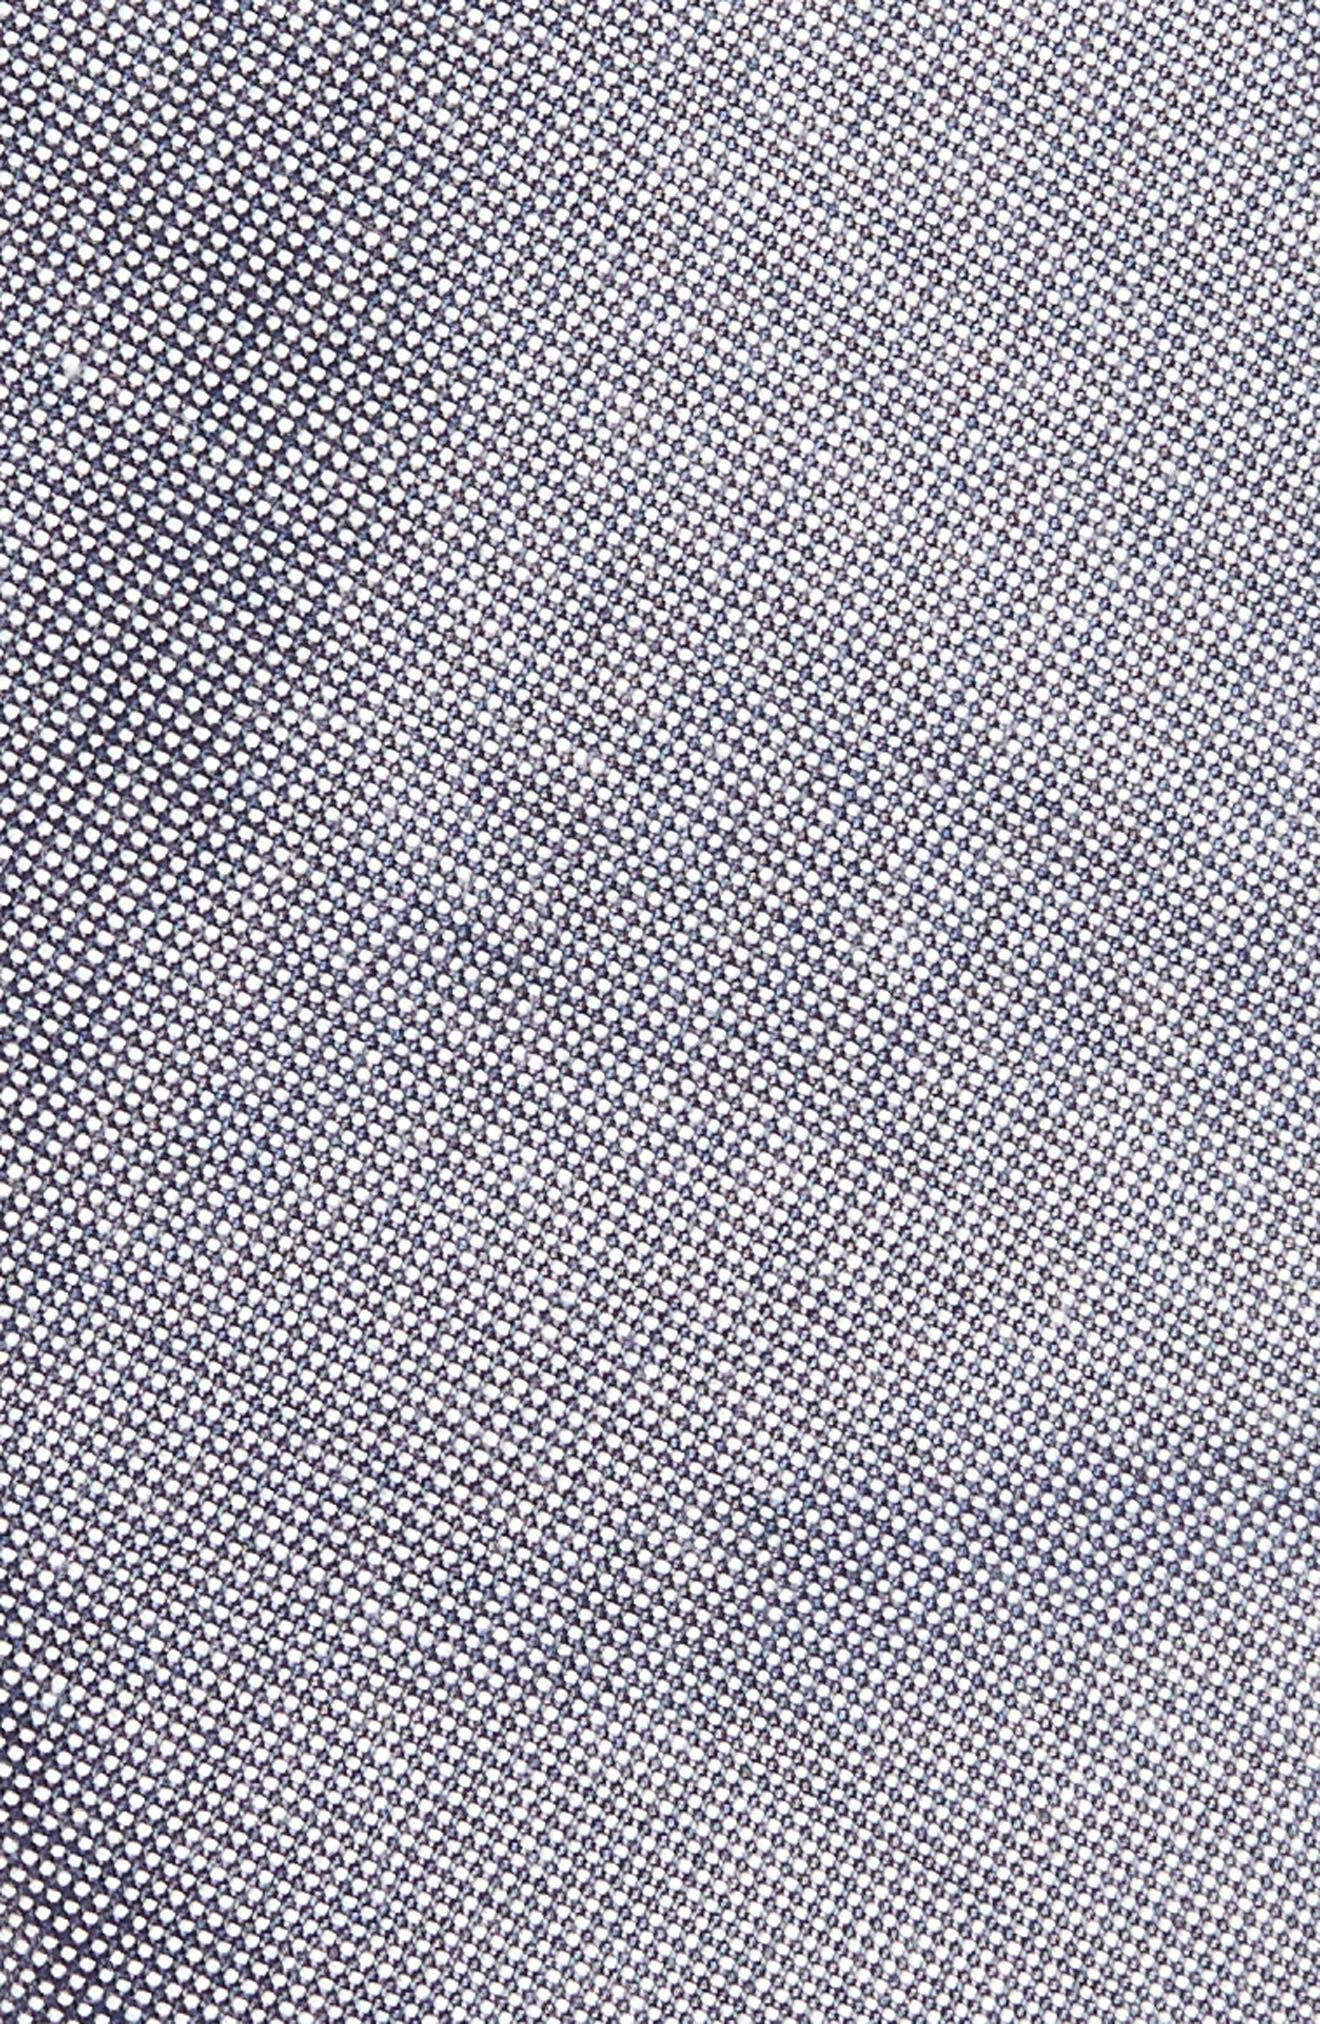 Alternate Image 2  - 1901 Solid Cotton Blend Tie